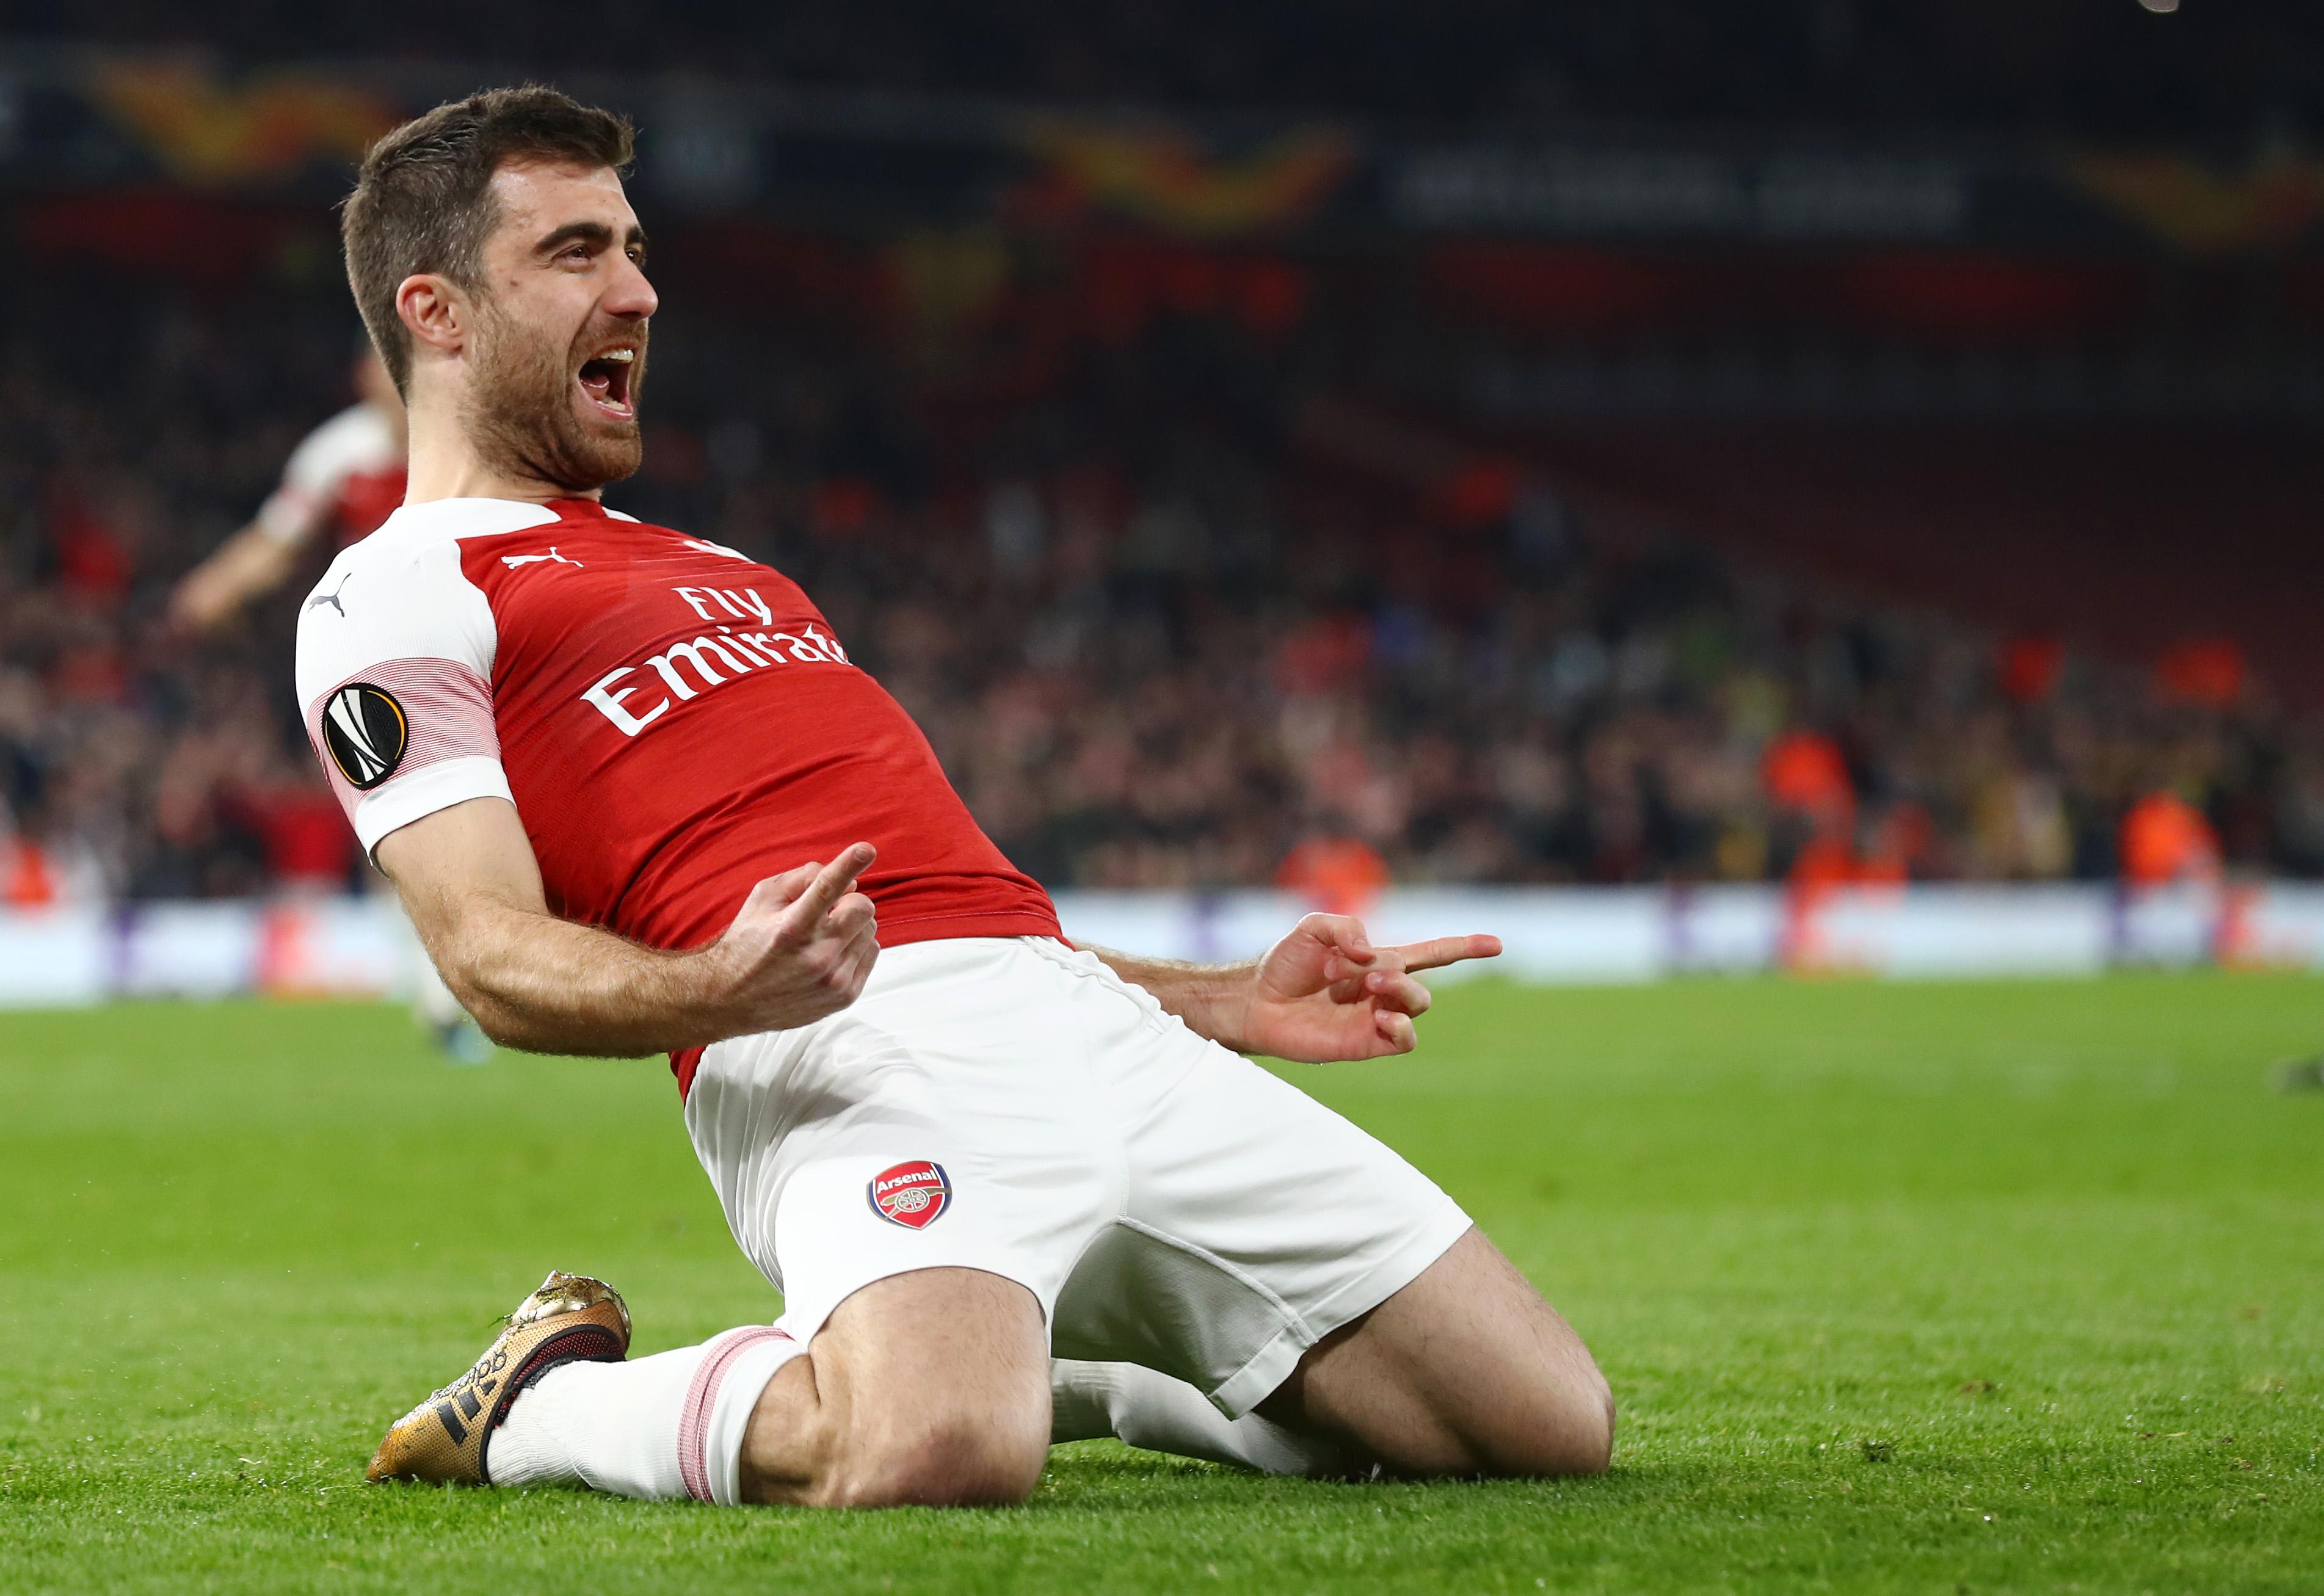 Match report: Arsenal 3, BATE Borisov 0